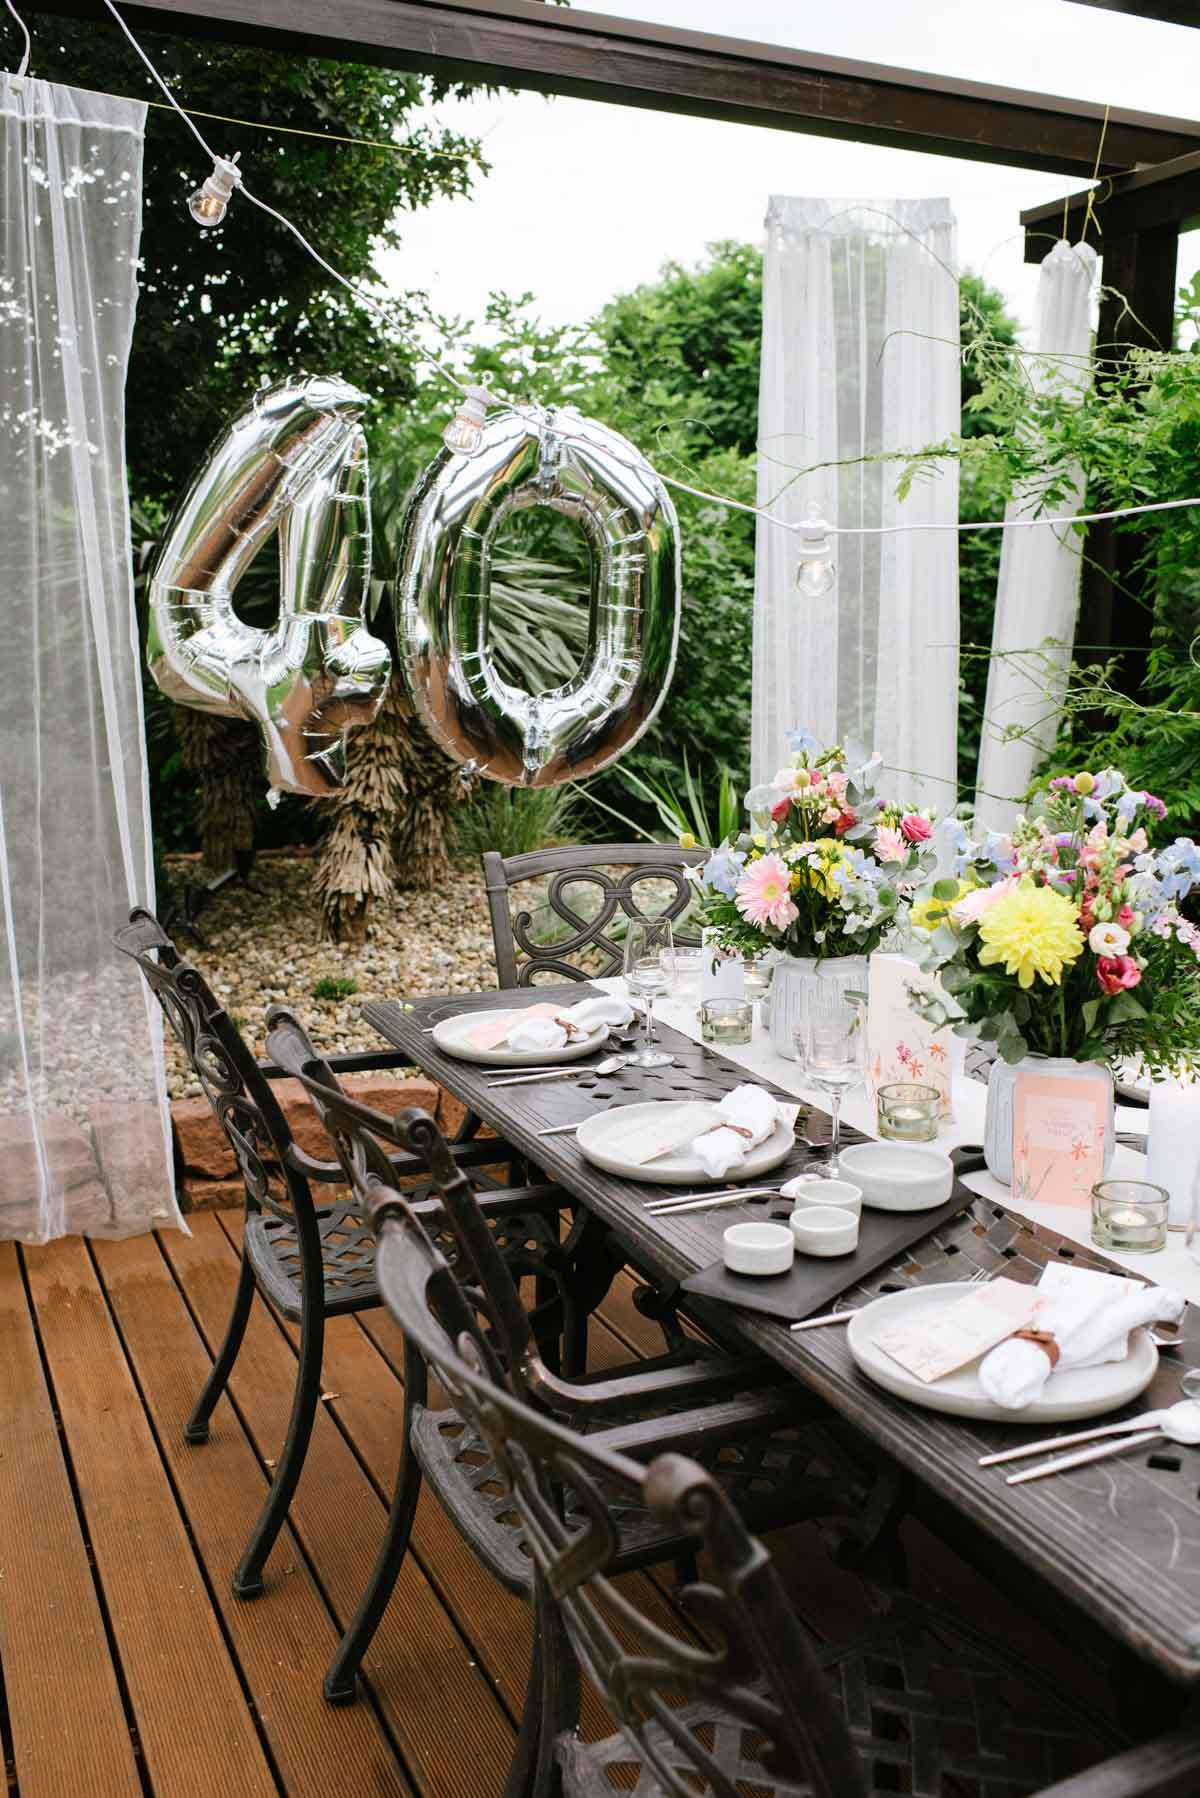 Deko zum 40. Geburtstag im Garten